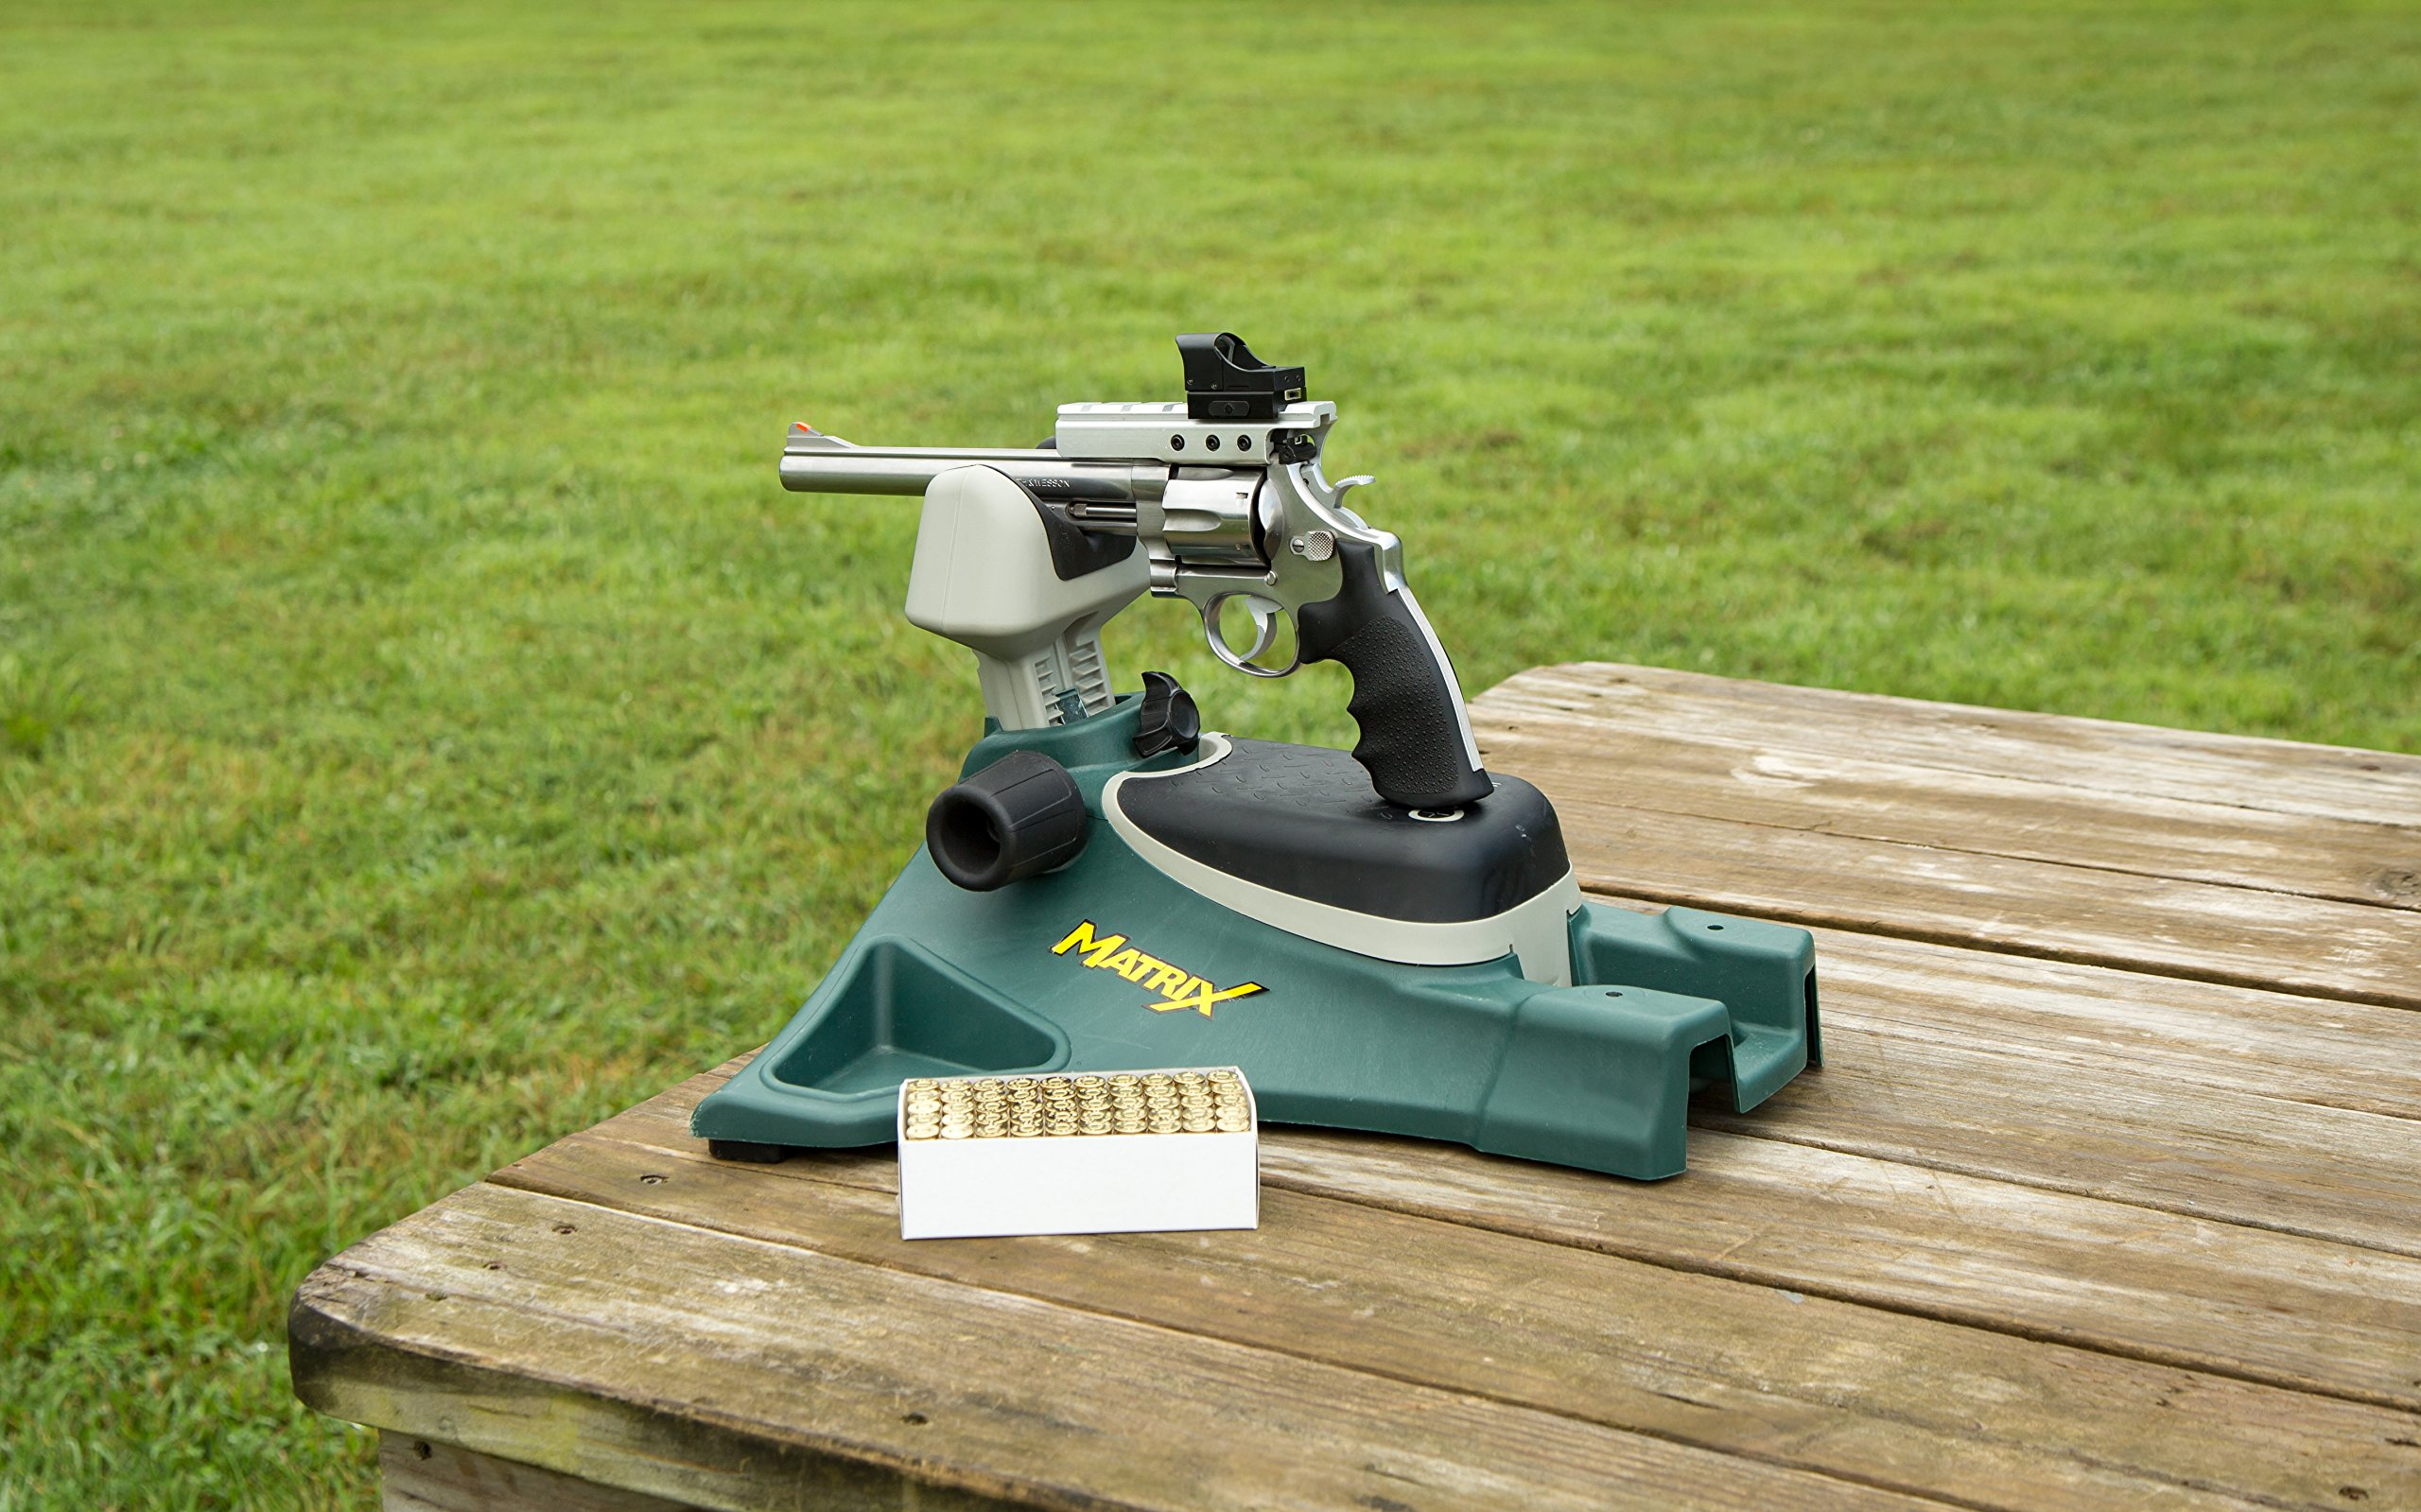 Caldwell Matrix Adjustable Ambidextrous Rifle Pistol Handgun Shooting Rest for Outdoor Range by Caldwell (Image #5)